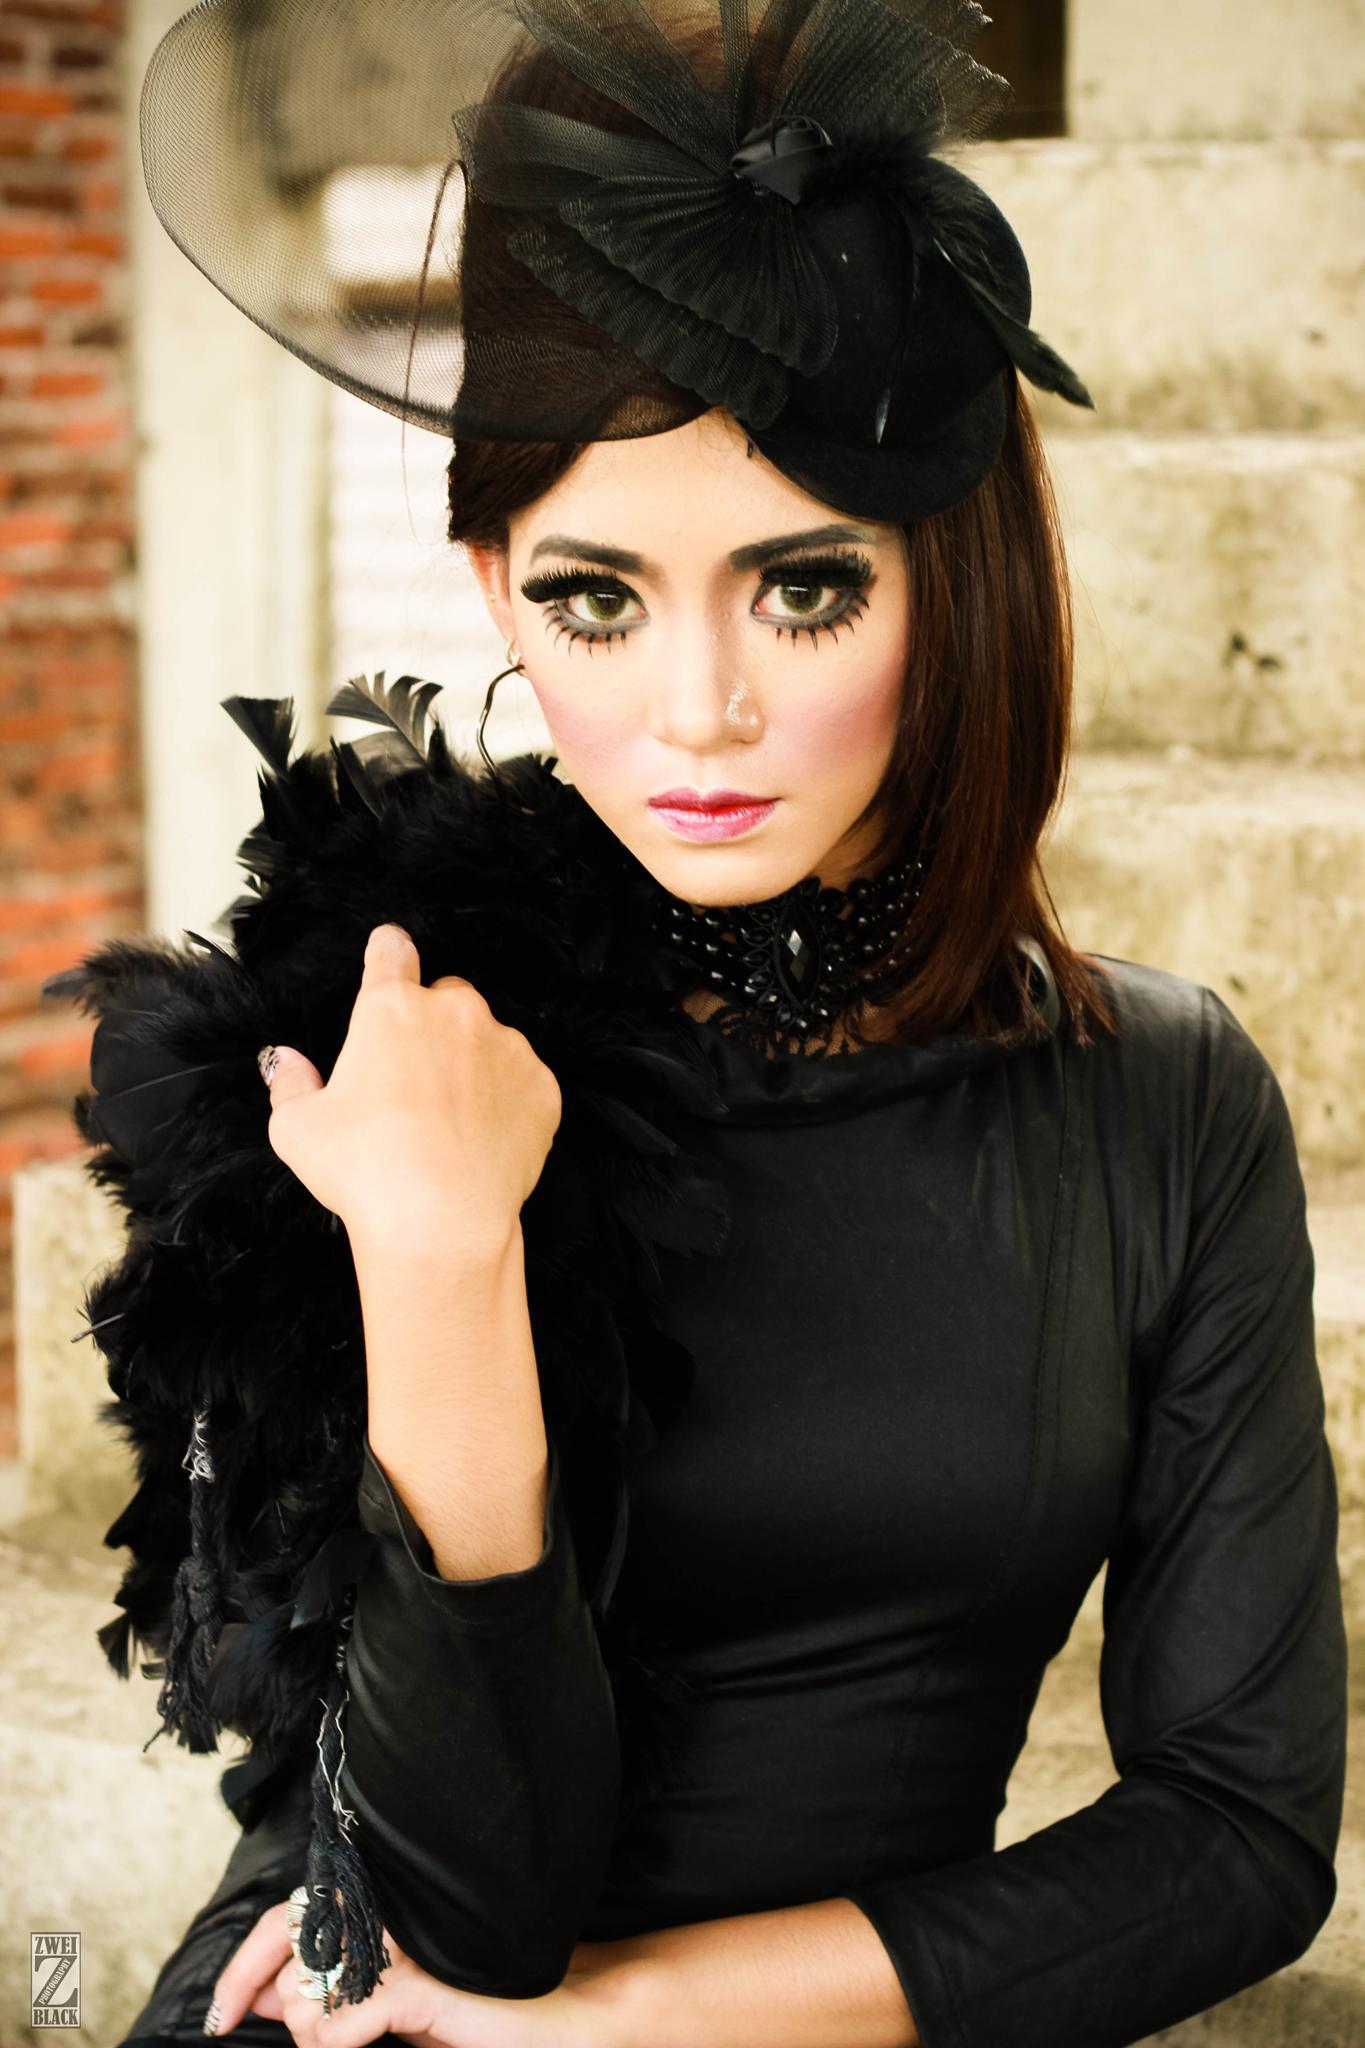 Black Glamour by Angga Raditya (ZweiBlack)